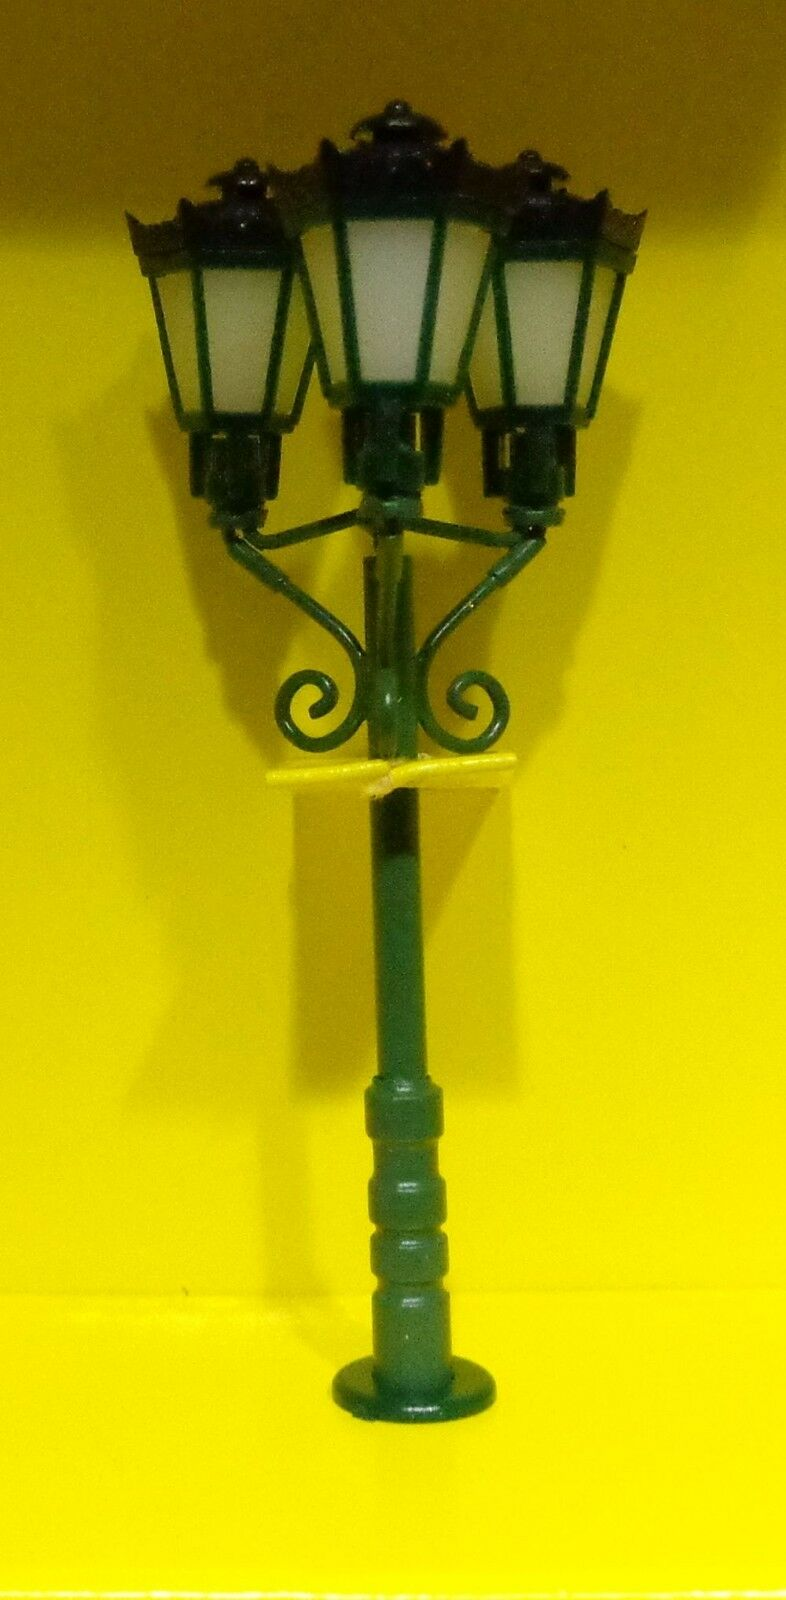 Viessmann h0 6079 trois lampadaire trois 6079 lampes vert 29dd3d